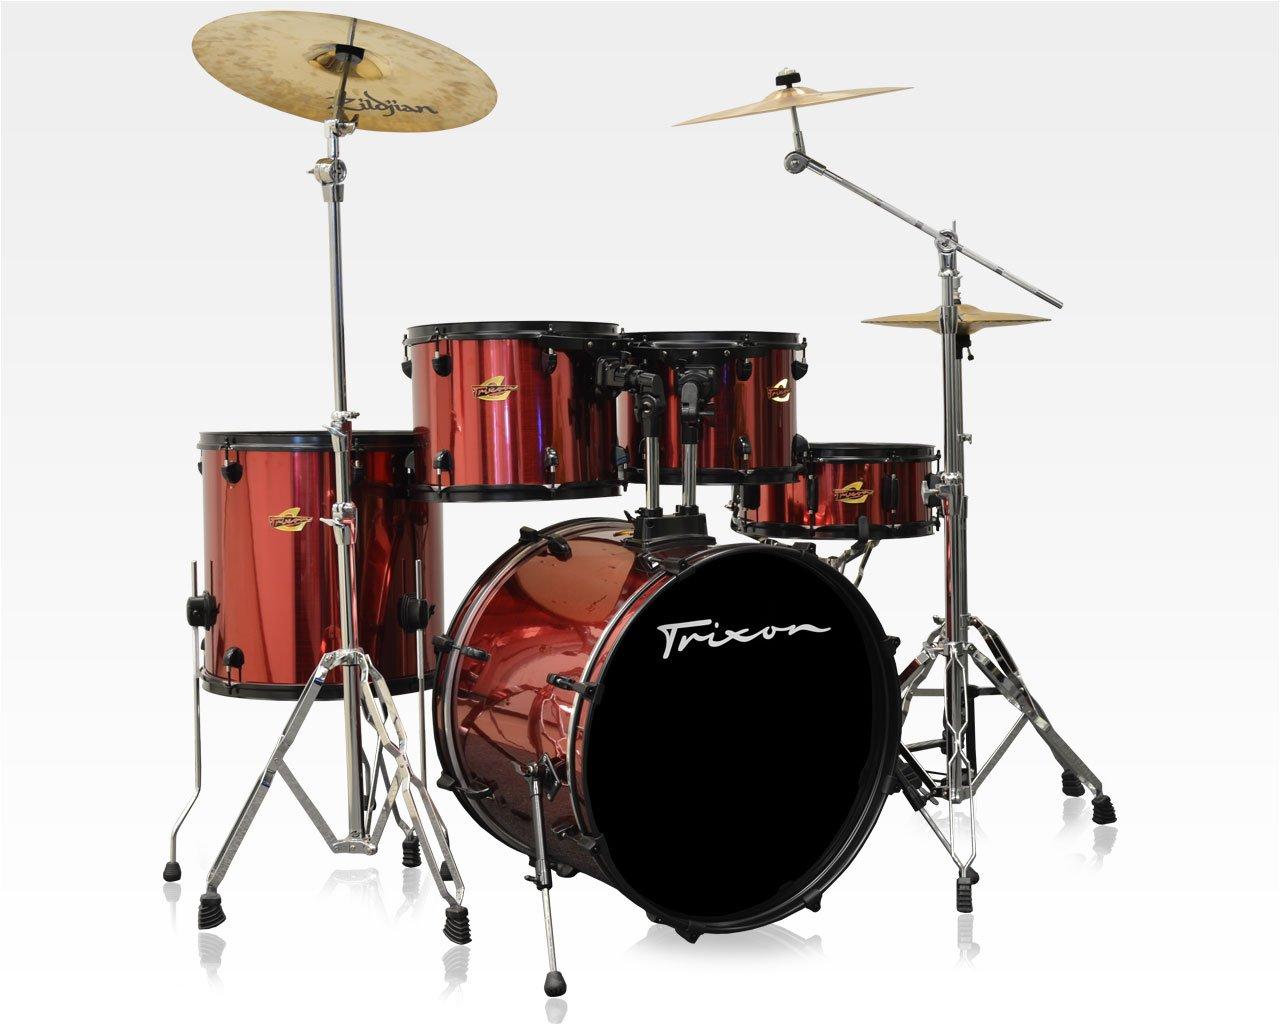 Trixon 2014 5-Piece Birch Kit - Stainless Crimson